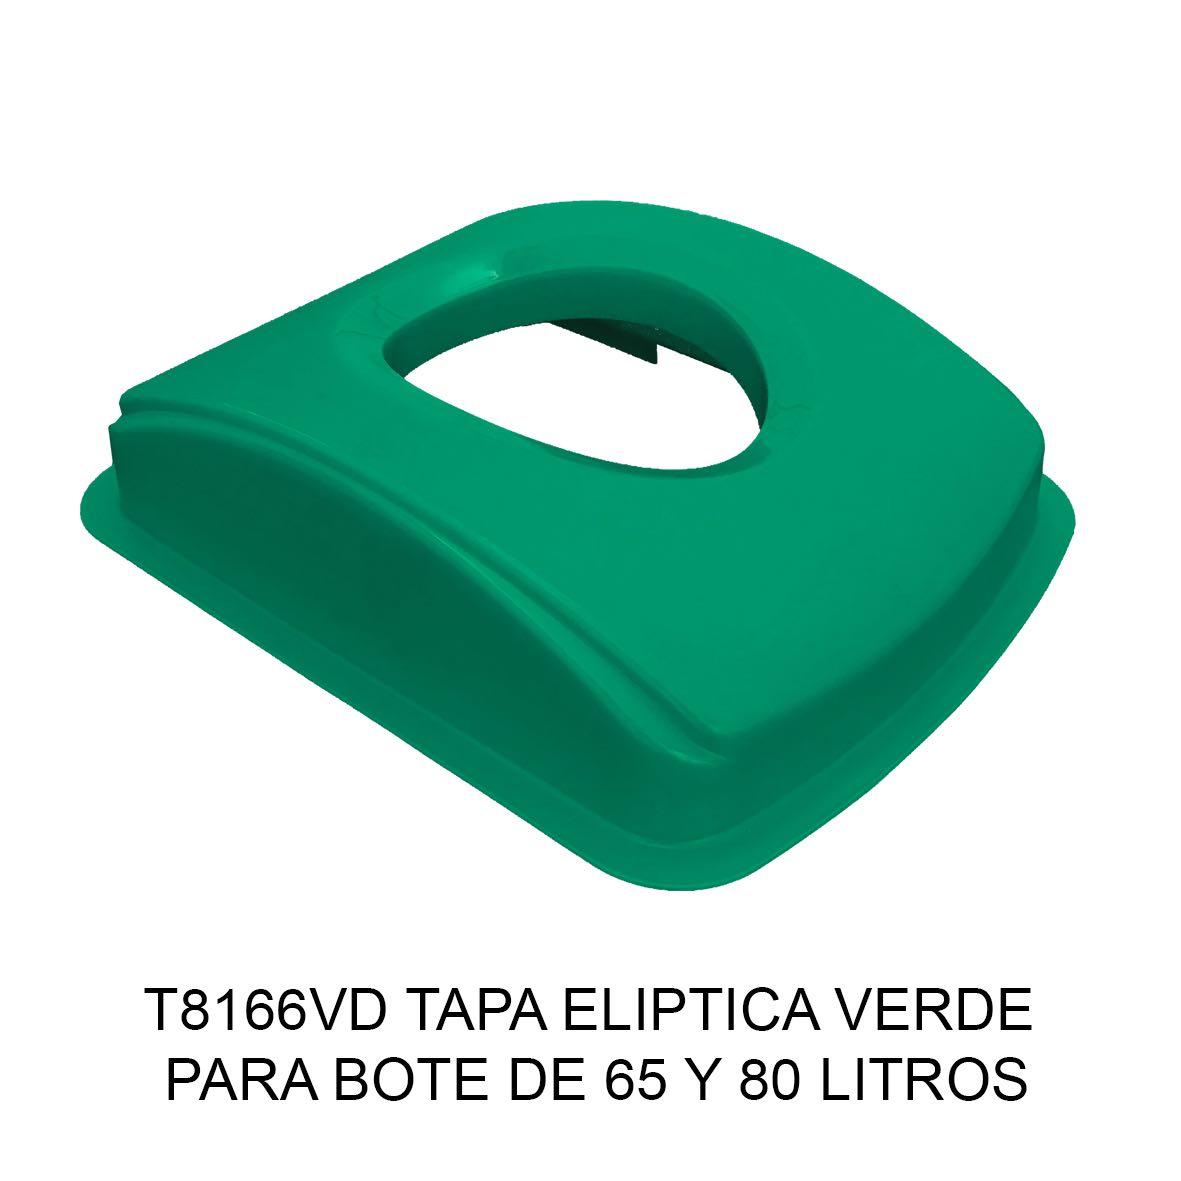 Tapa elíptica para bote de basura color verde para botes de 65 y 80 litros Modelo T8166VD de Sablón